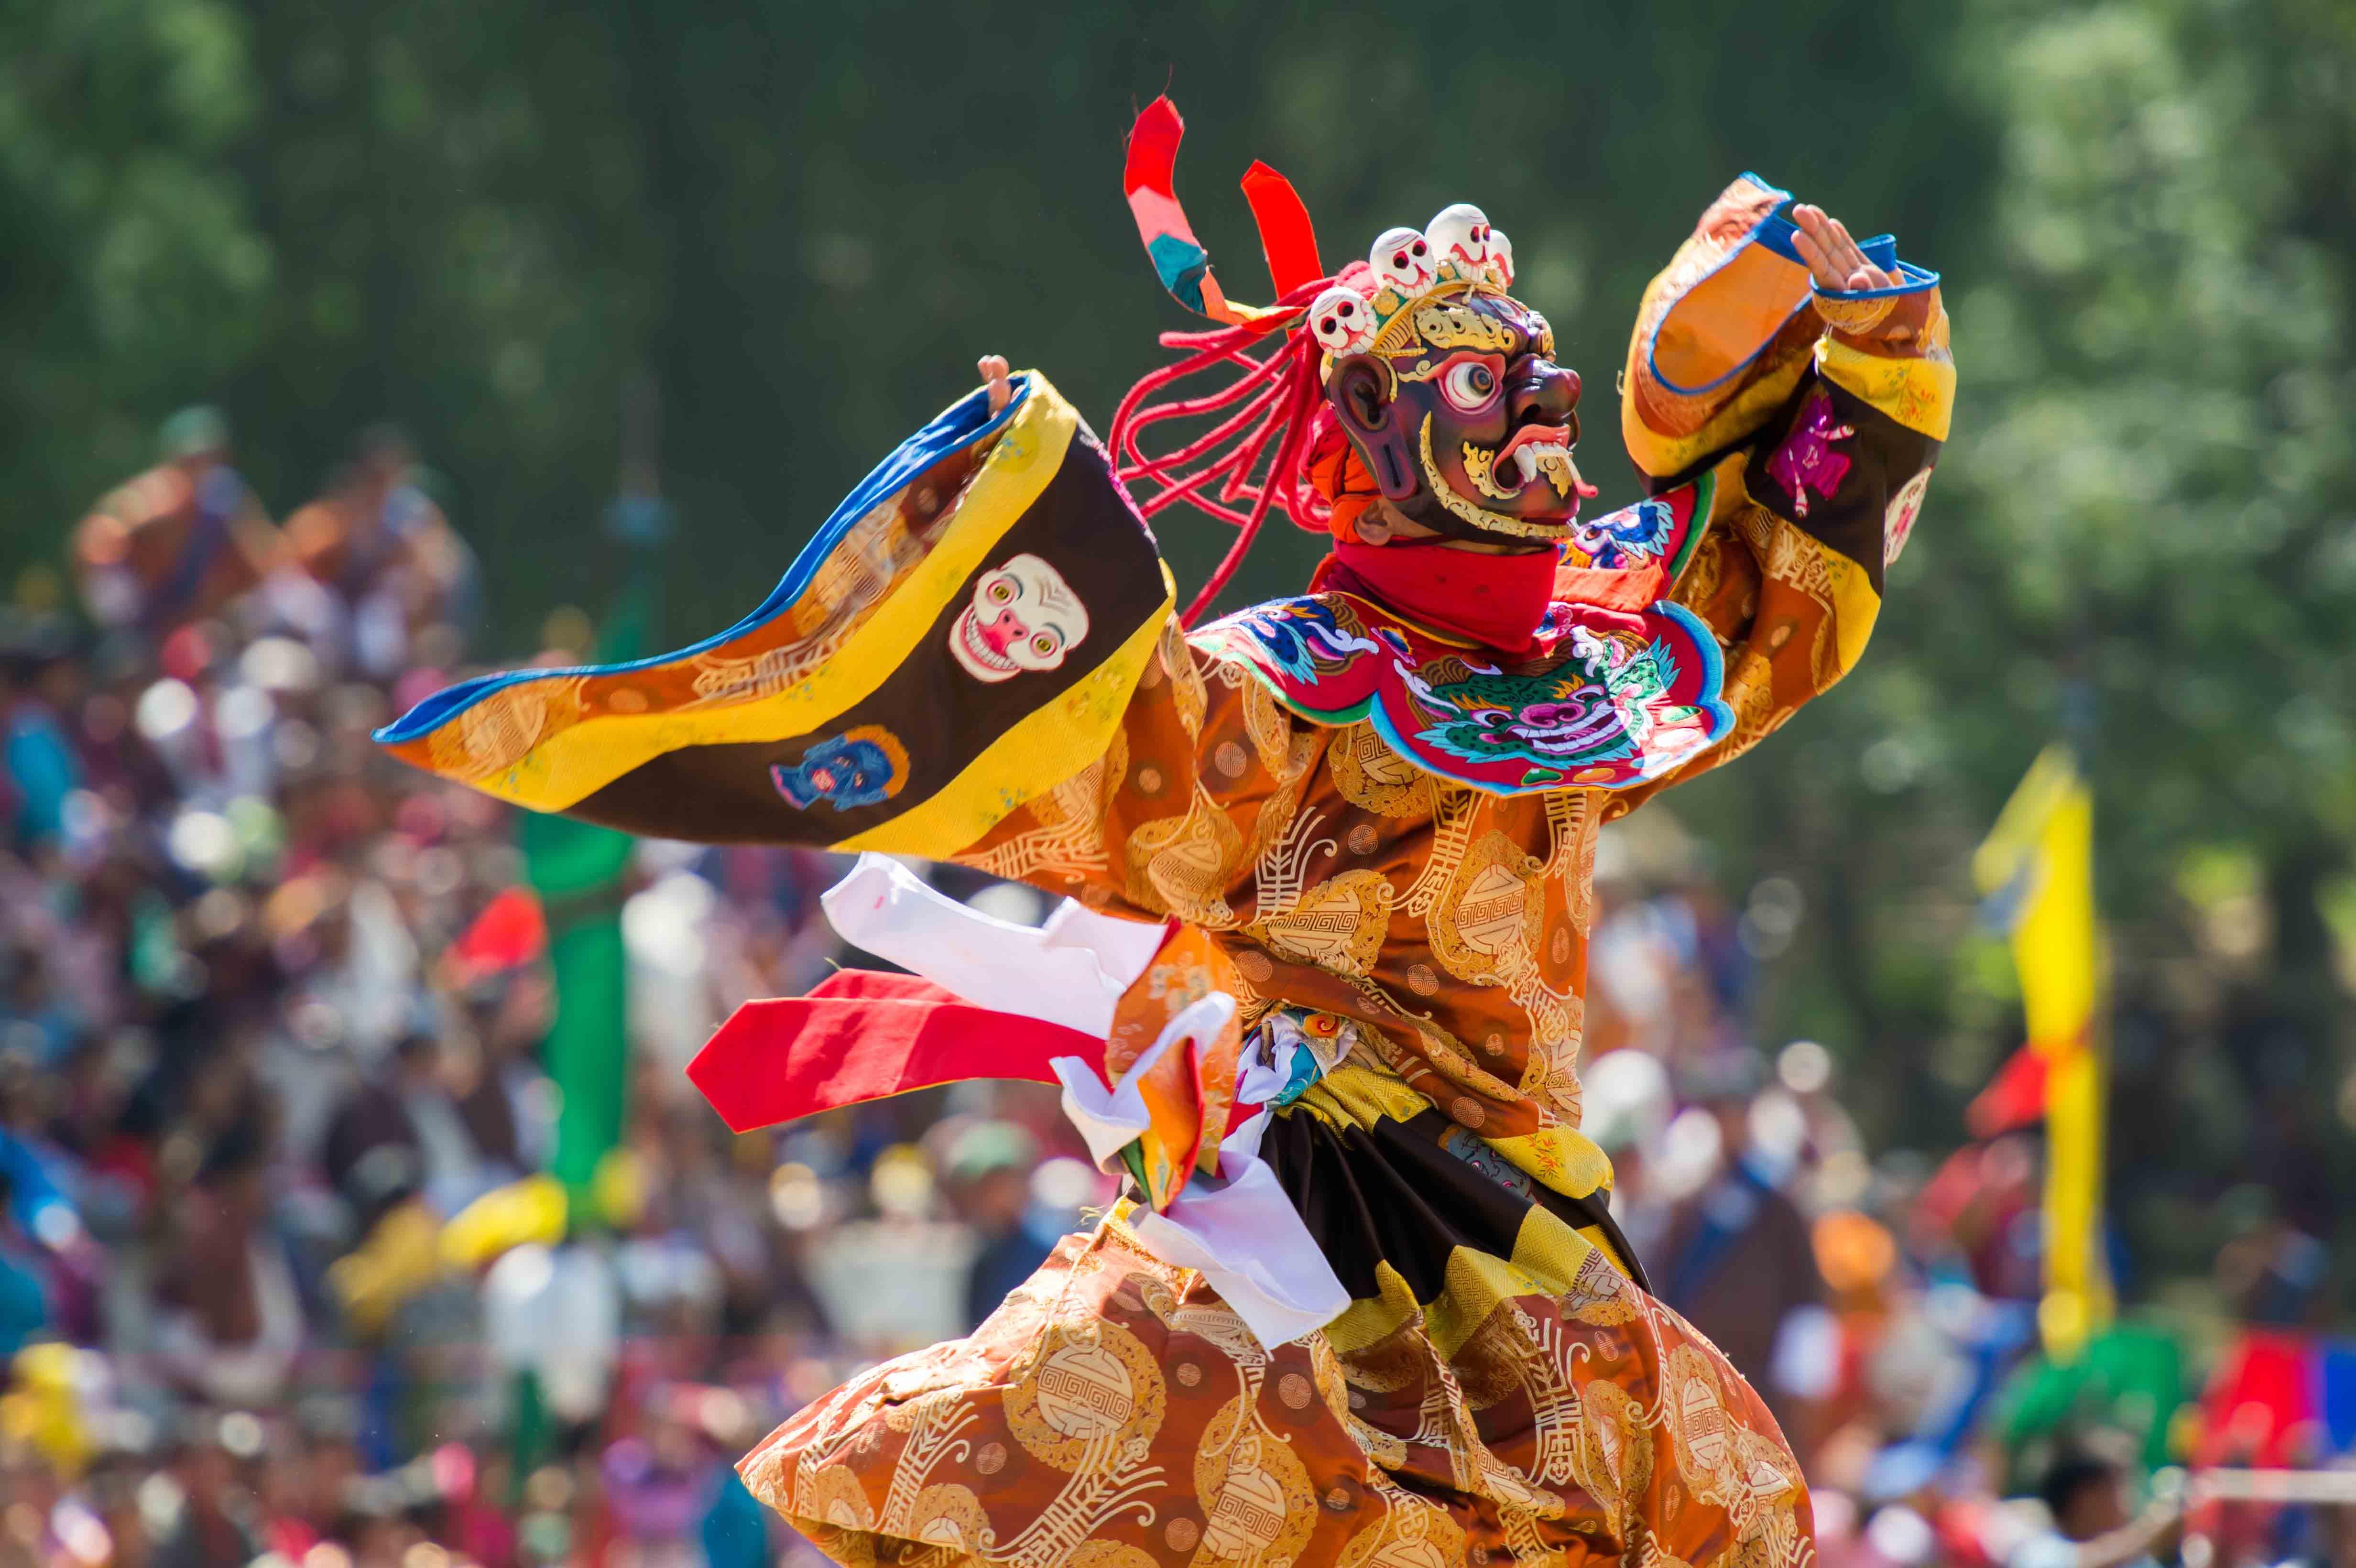 Wangdue Phodrang Festival – 24 to 26 Sept, 2020